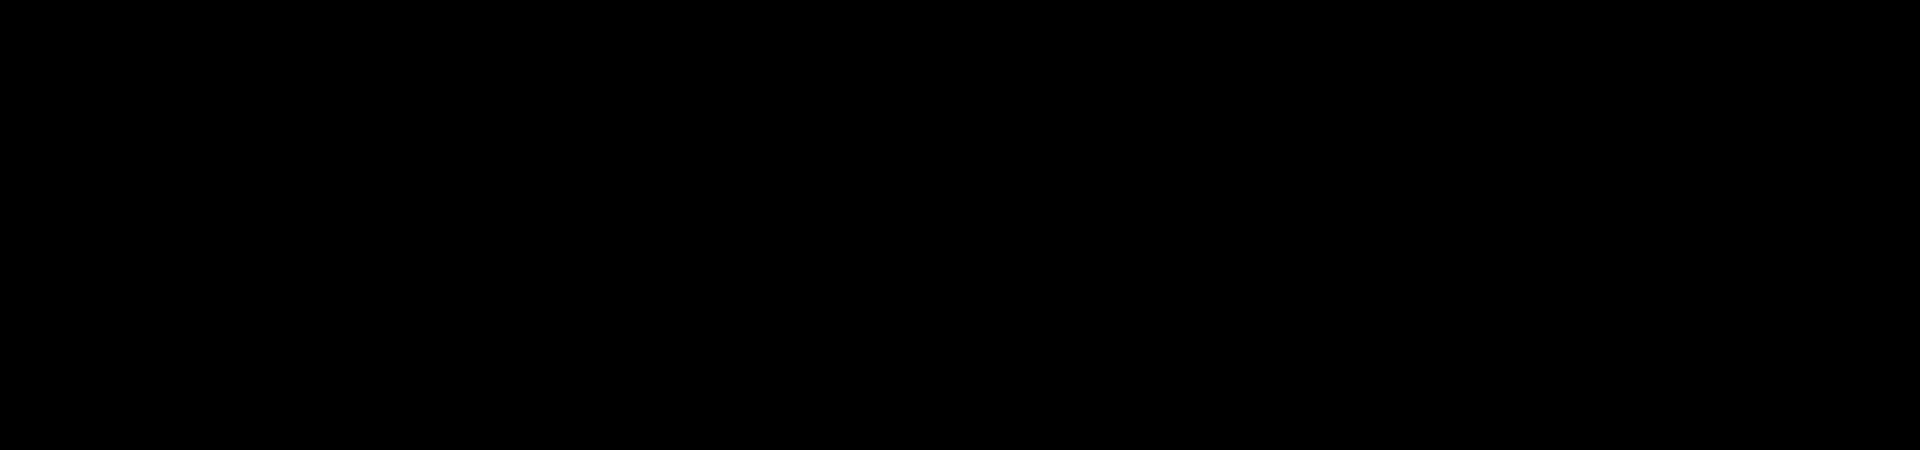 black-fon